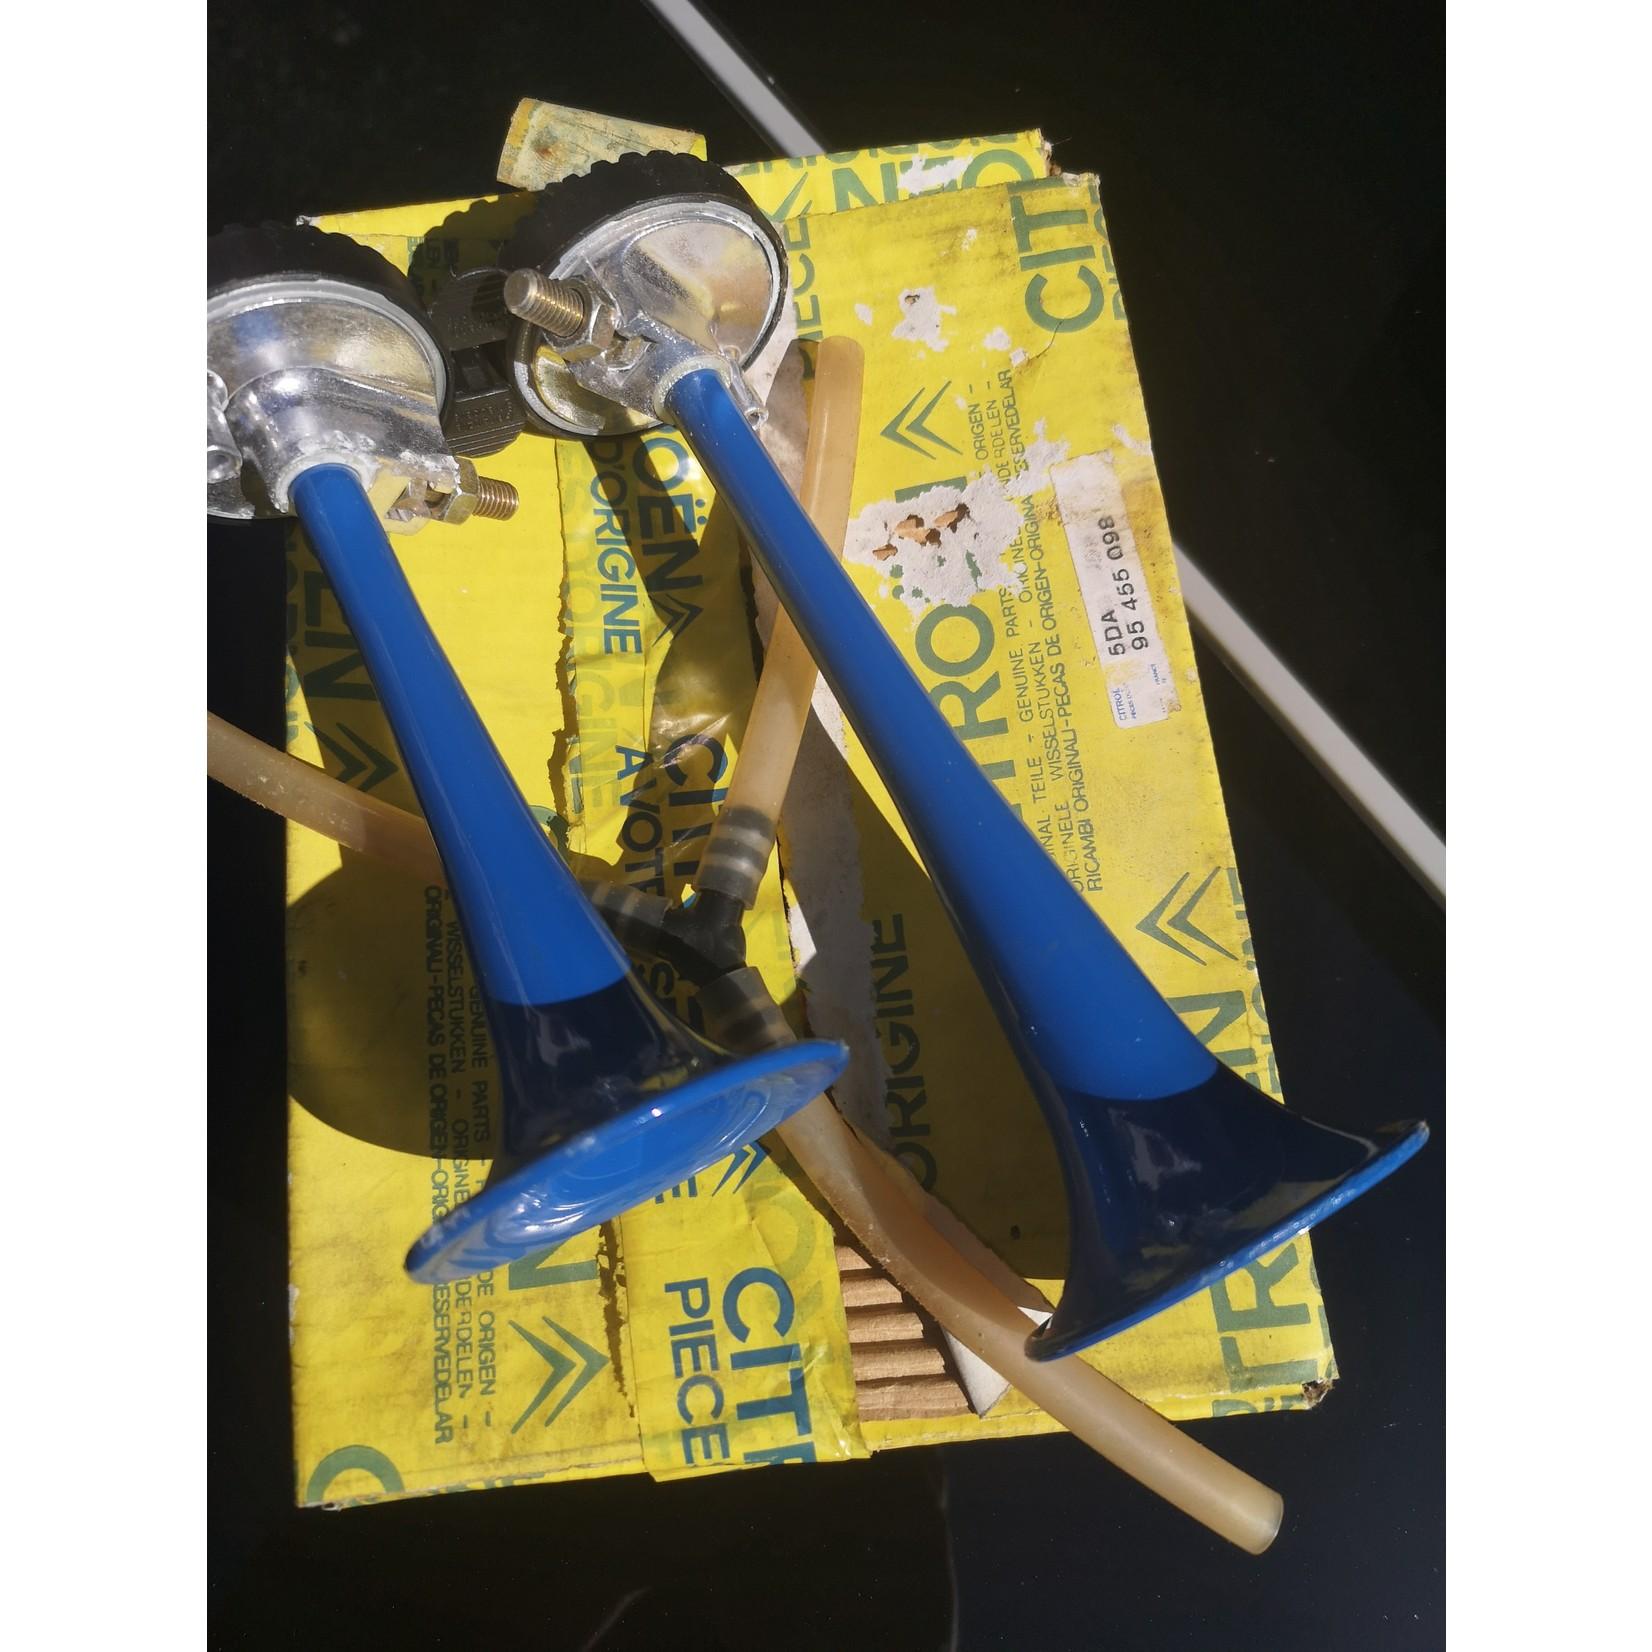 Hoorn trompetten DS / ID / SM origineel Nr Org: 95455098